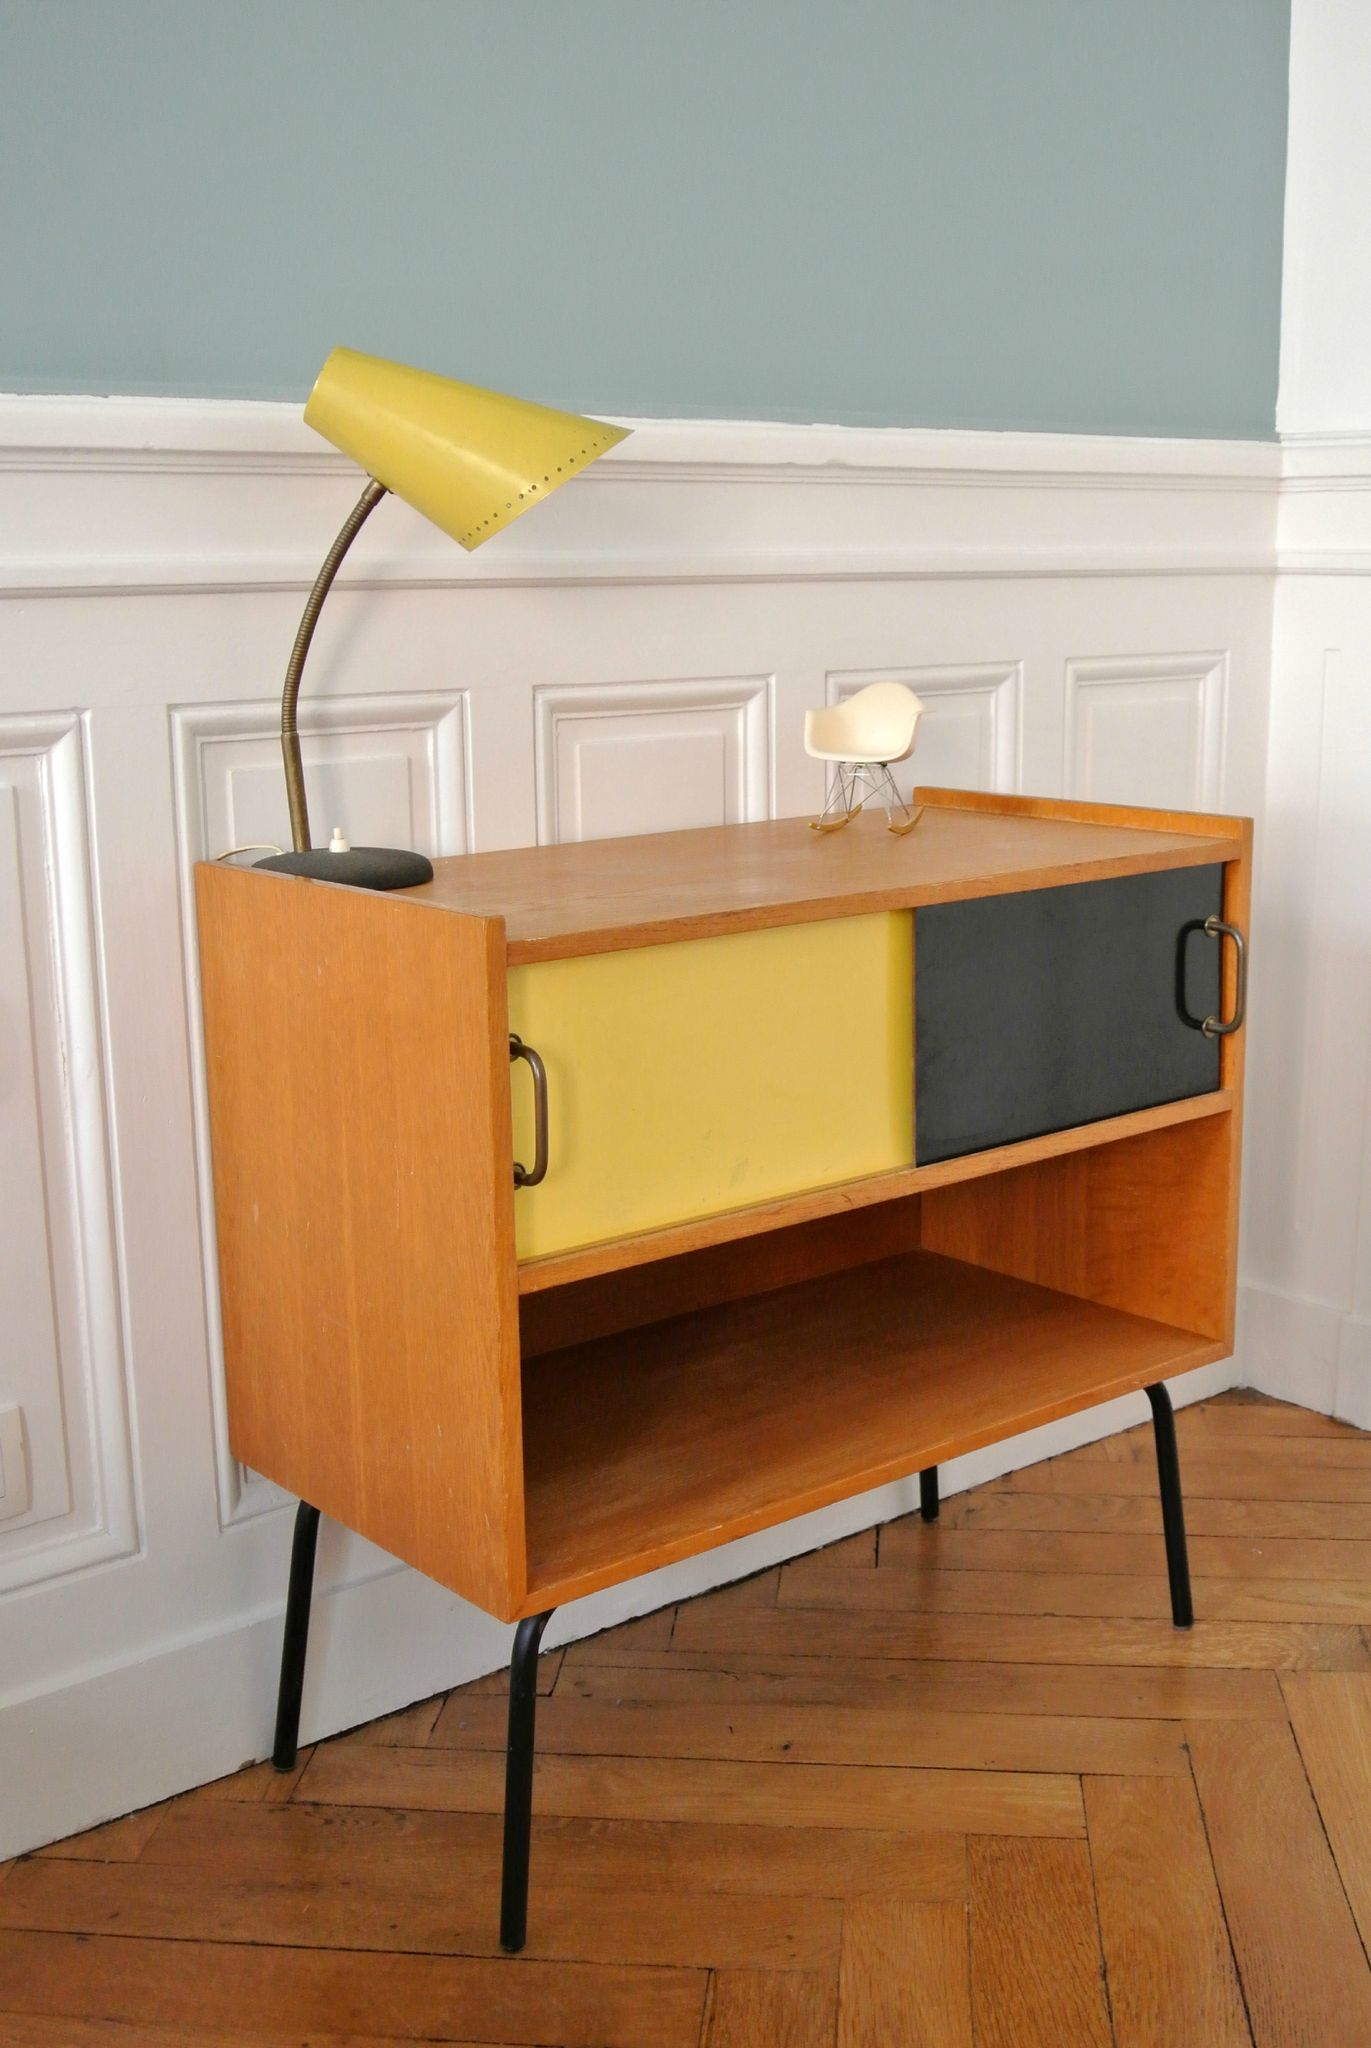 Meuble d 39 appoint ann es 50 solveig vintage kids - Meuble tv annee 50 ...